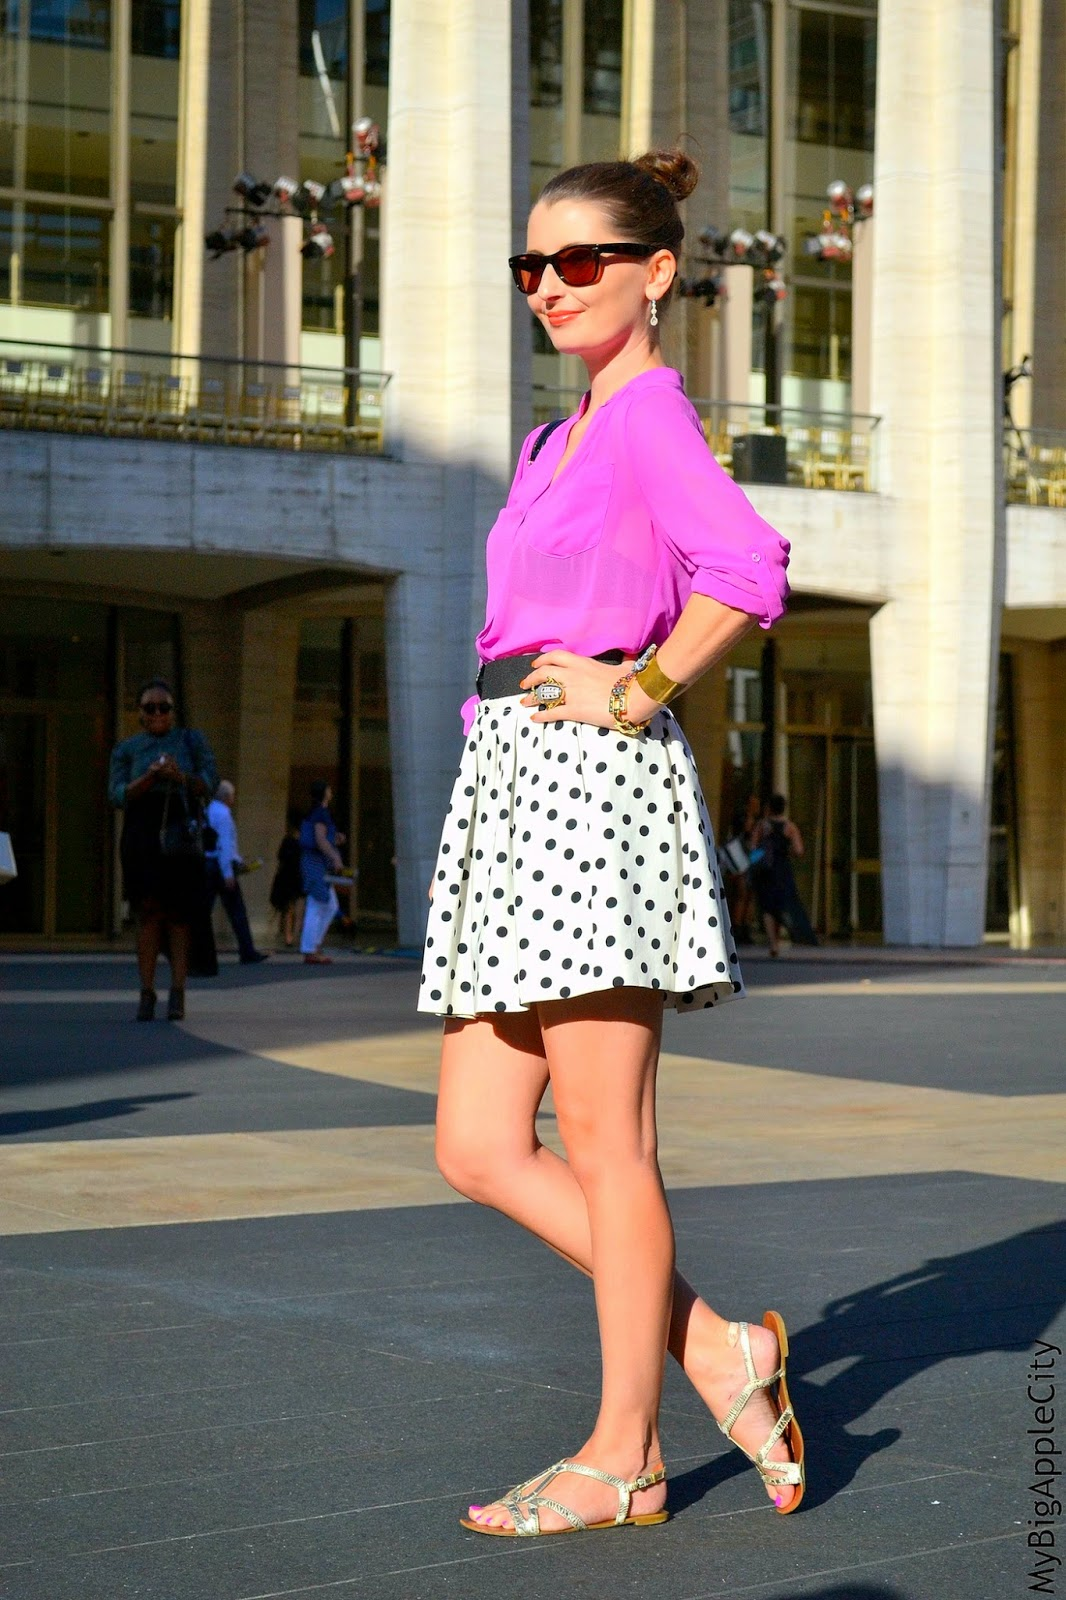 nyc-spring-2014-streetstyle-skirt-blog